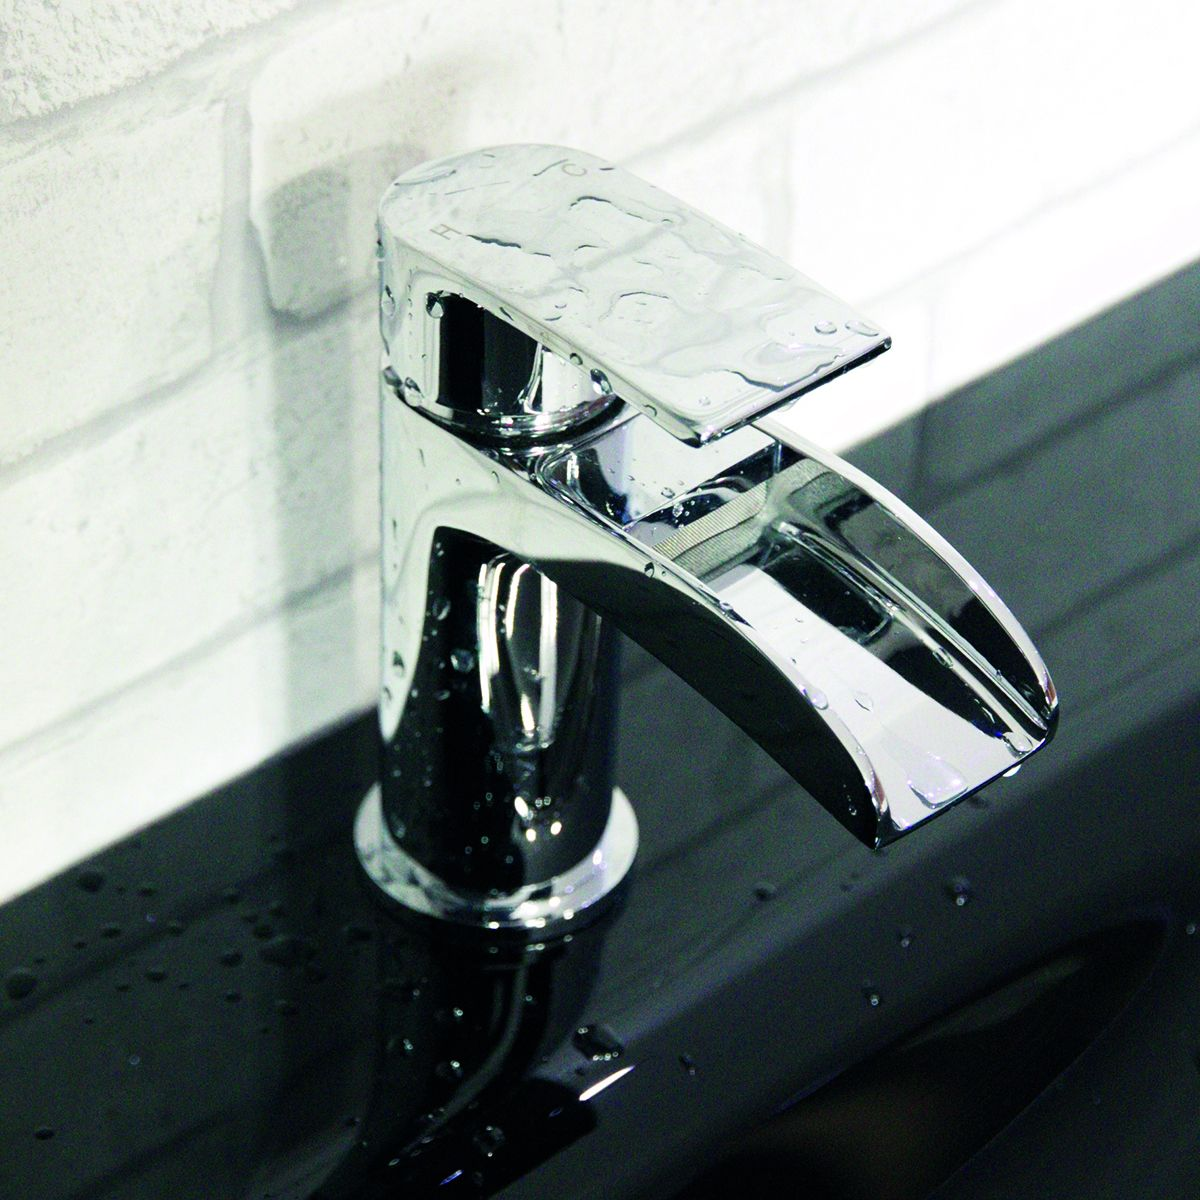 Cassellie Halton Waterfall tap installed on a basin